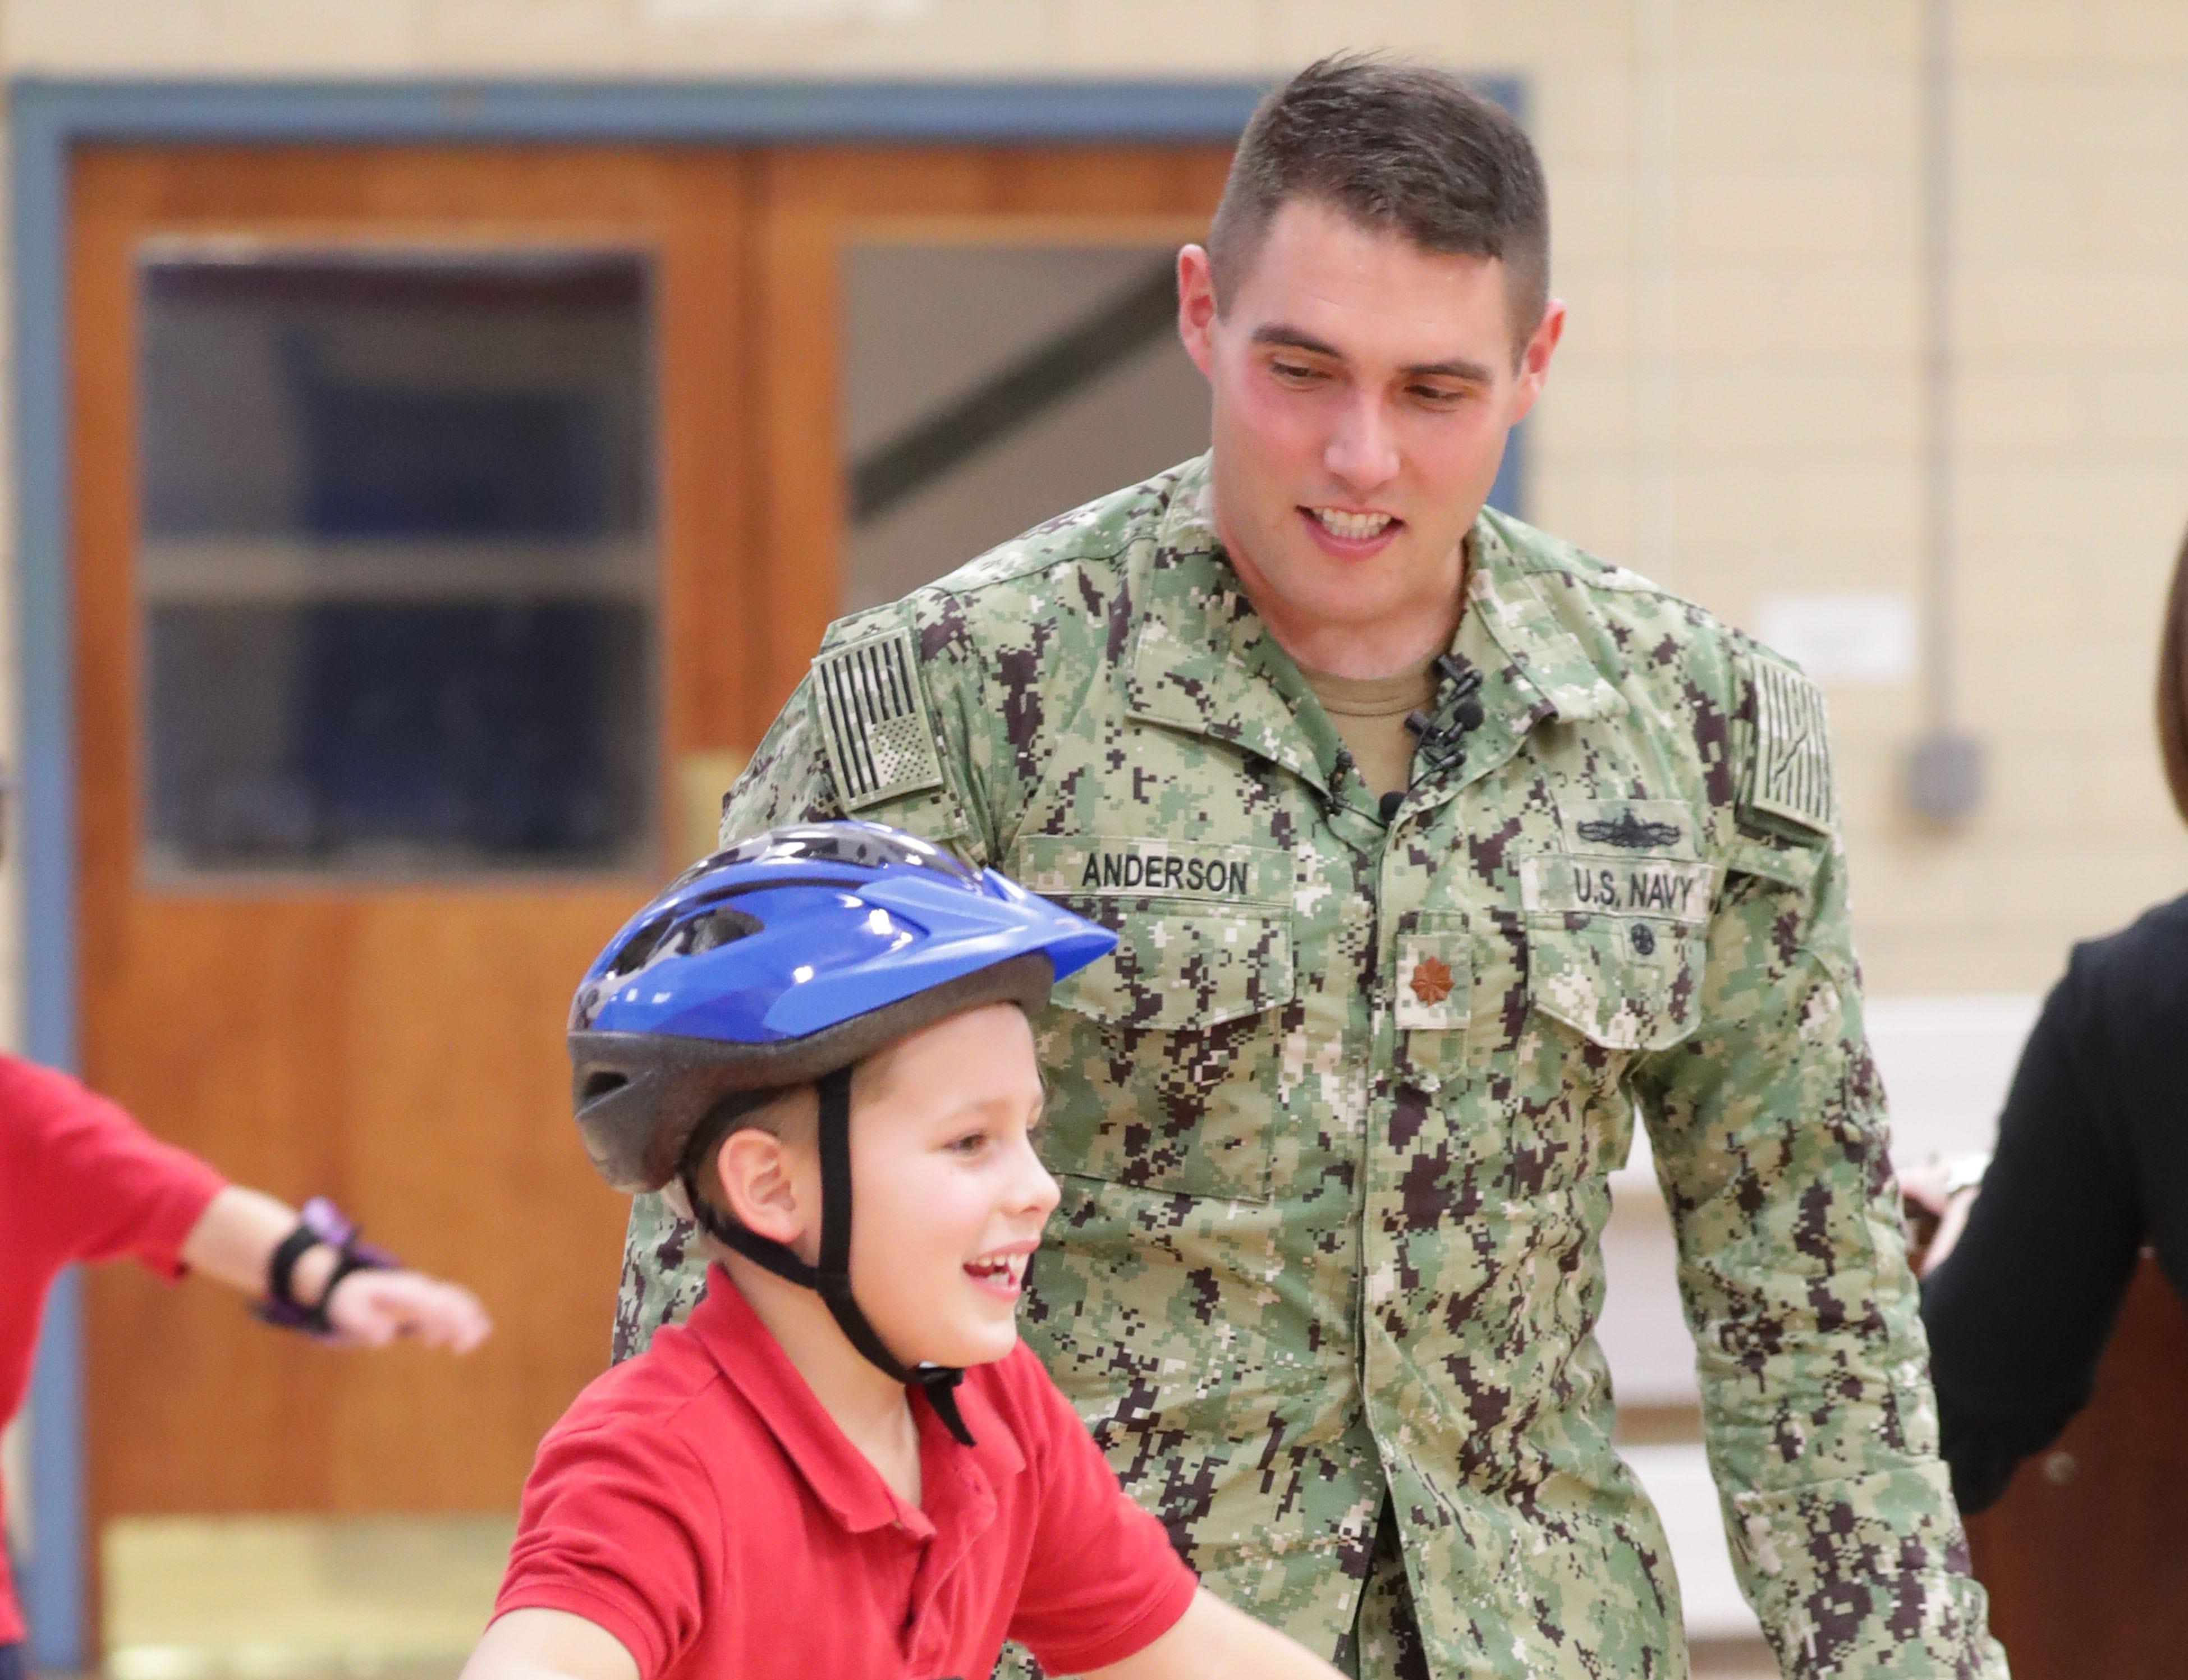 Navy Lt. Cmdr. Jon-Andrew Anderson-Ingebrigtsen helps his son on skates in gym class.